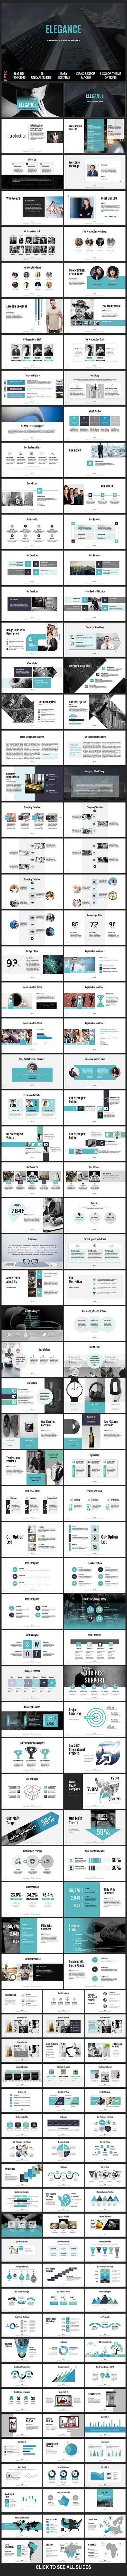 elegance - #powerpoint template - powerpoint templates presentation, Buy Powerpoint Templates, Powerpoint templates